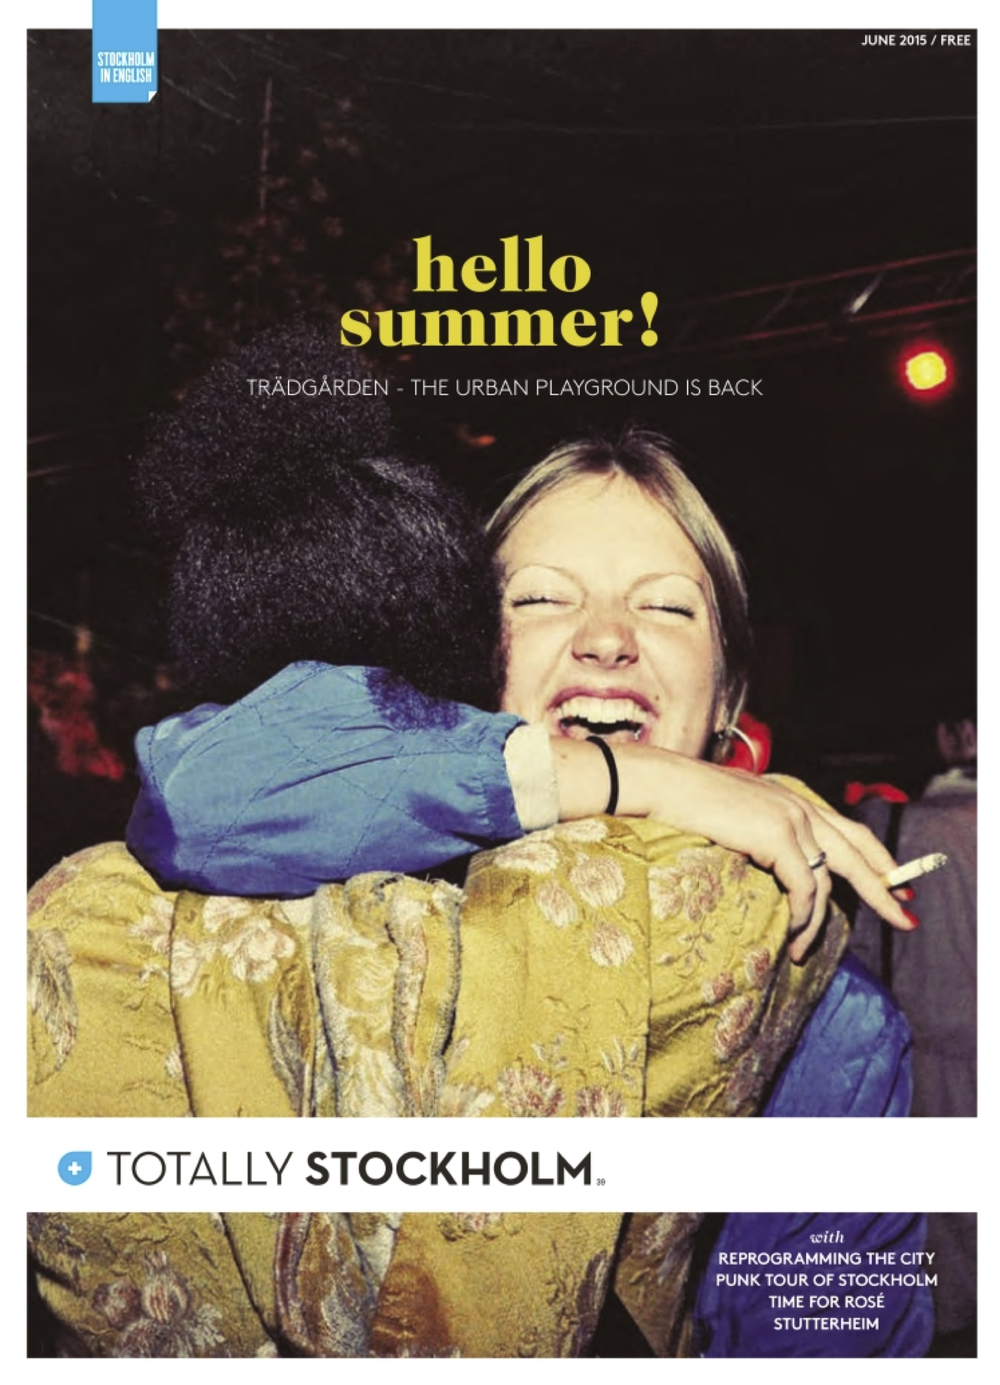 Trädgården - omslag Totally Stockholm juni 2015.jpeg